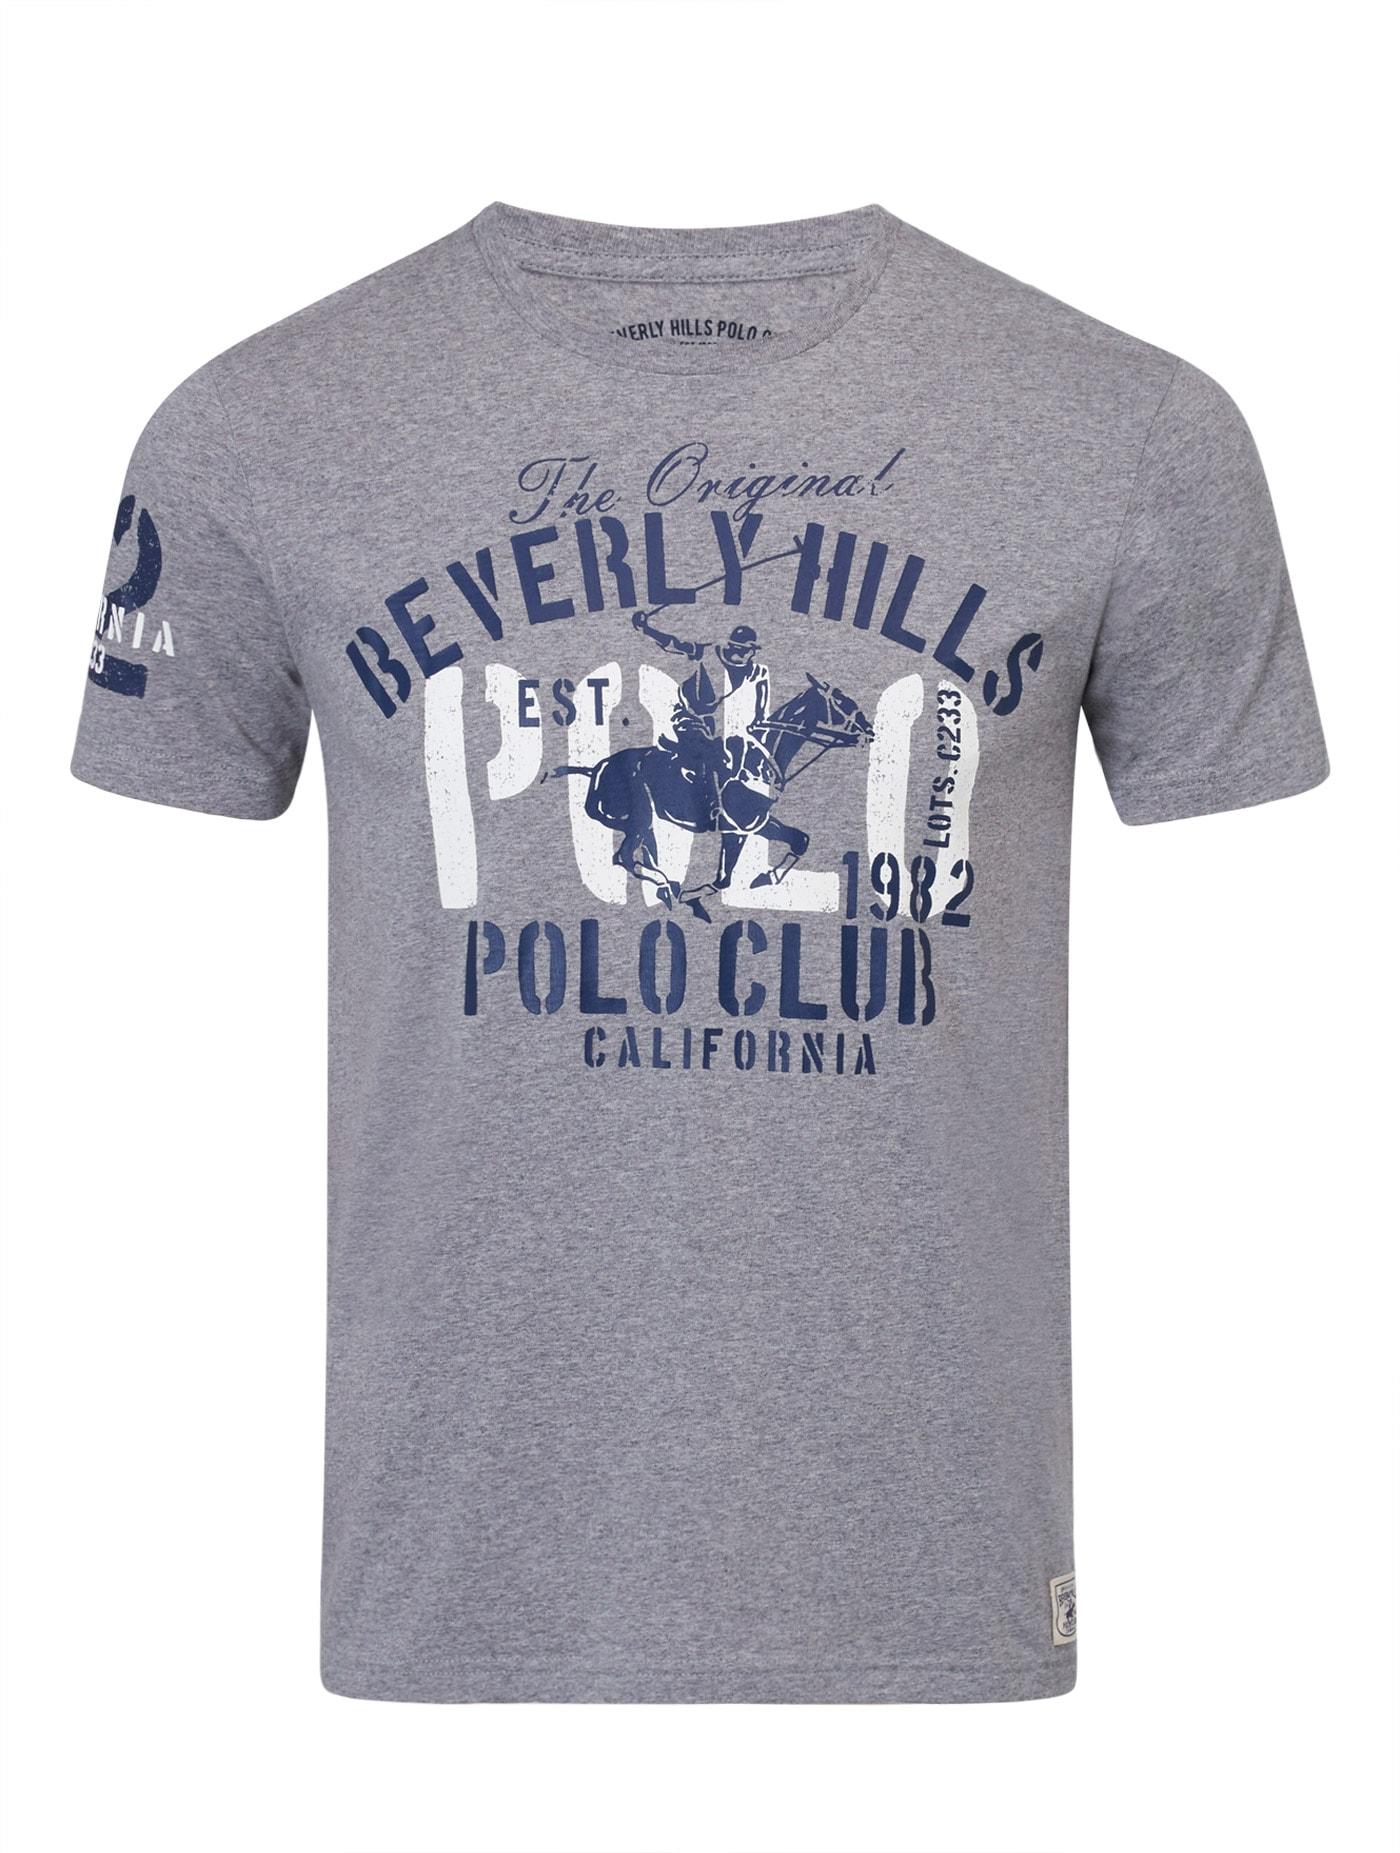 Beverly Hills Polo Club Short Sleeve Crewneck T-Shirt Mens Cotton Blend NEW